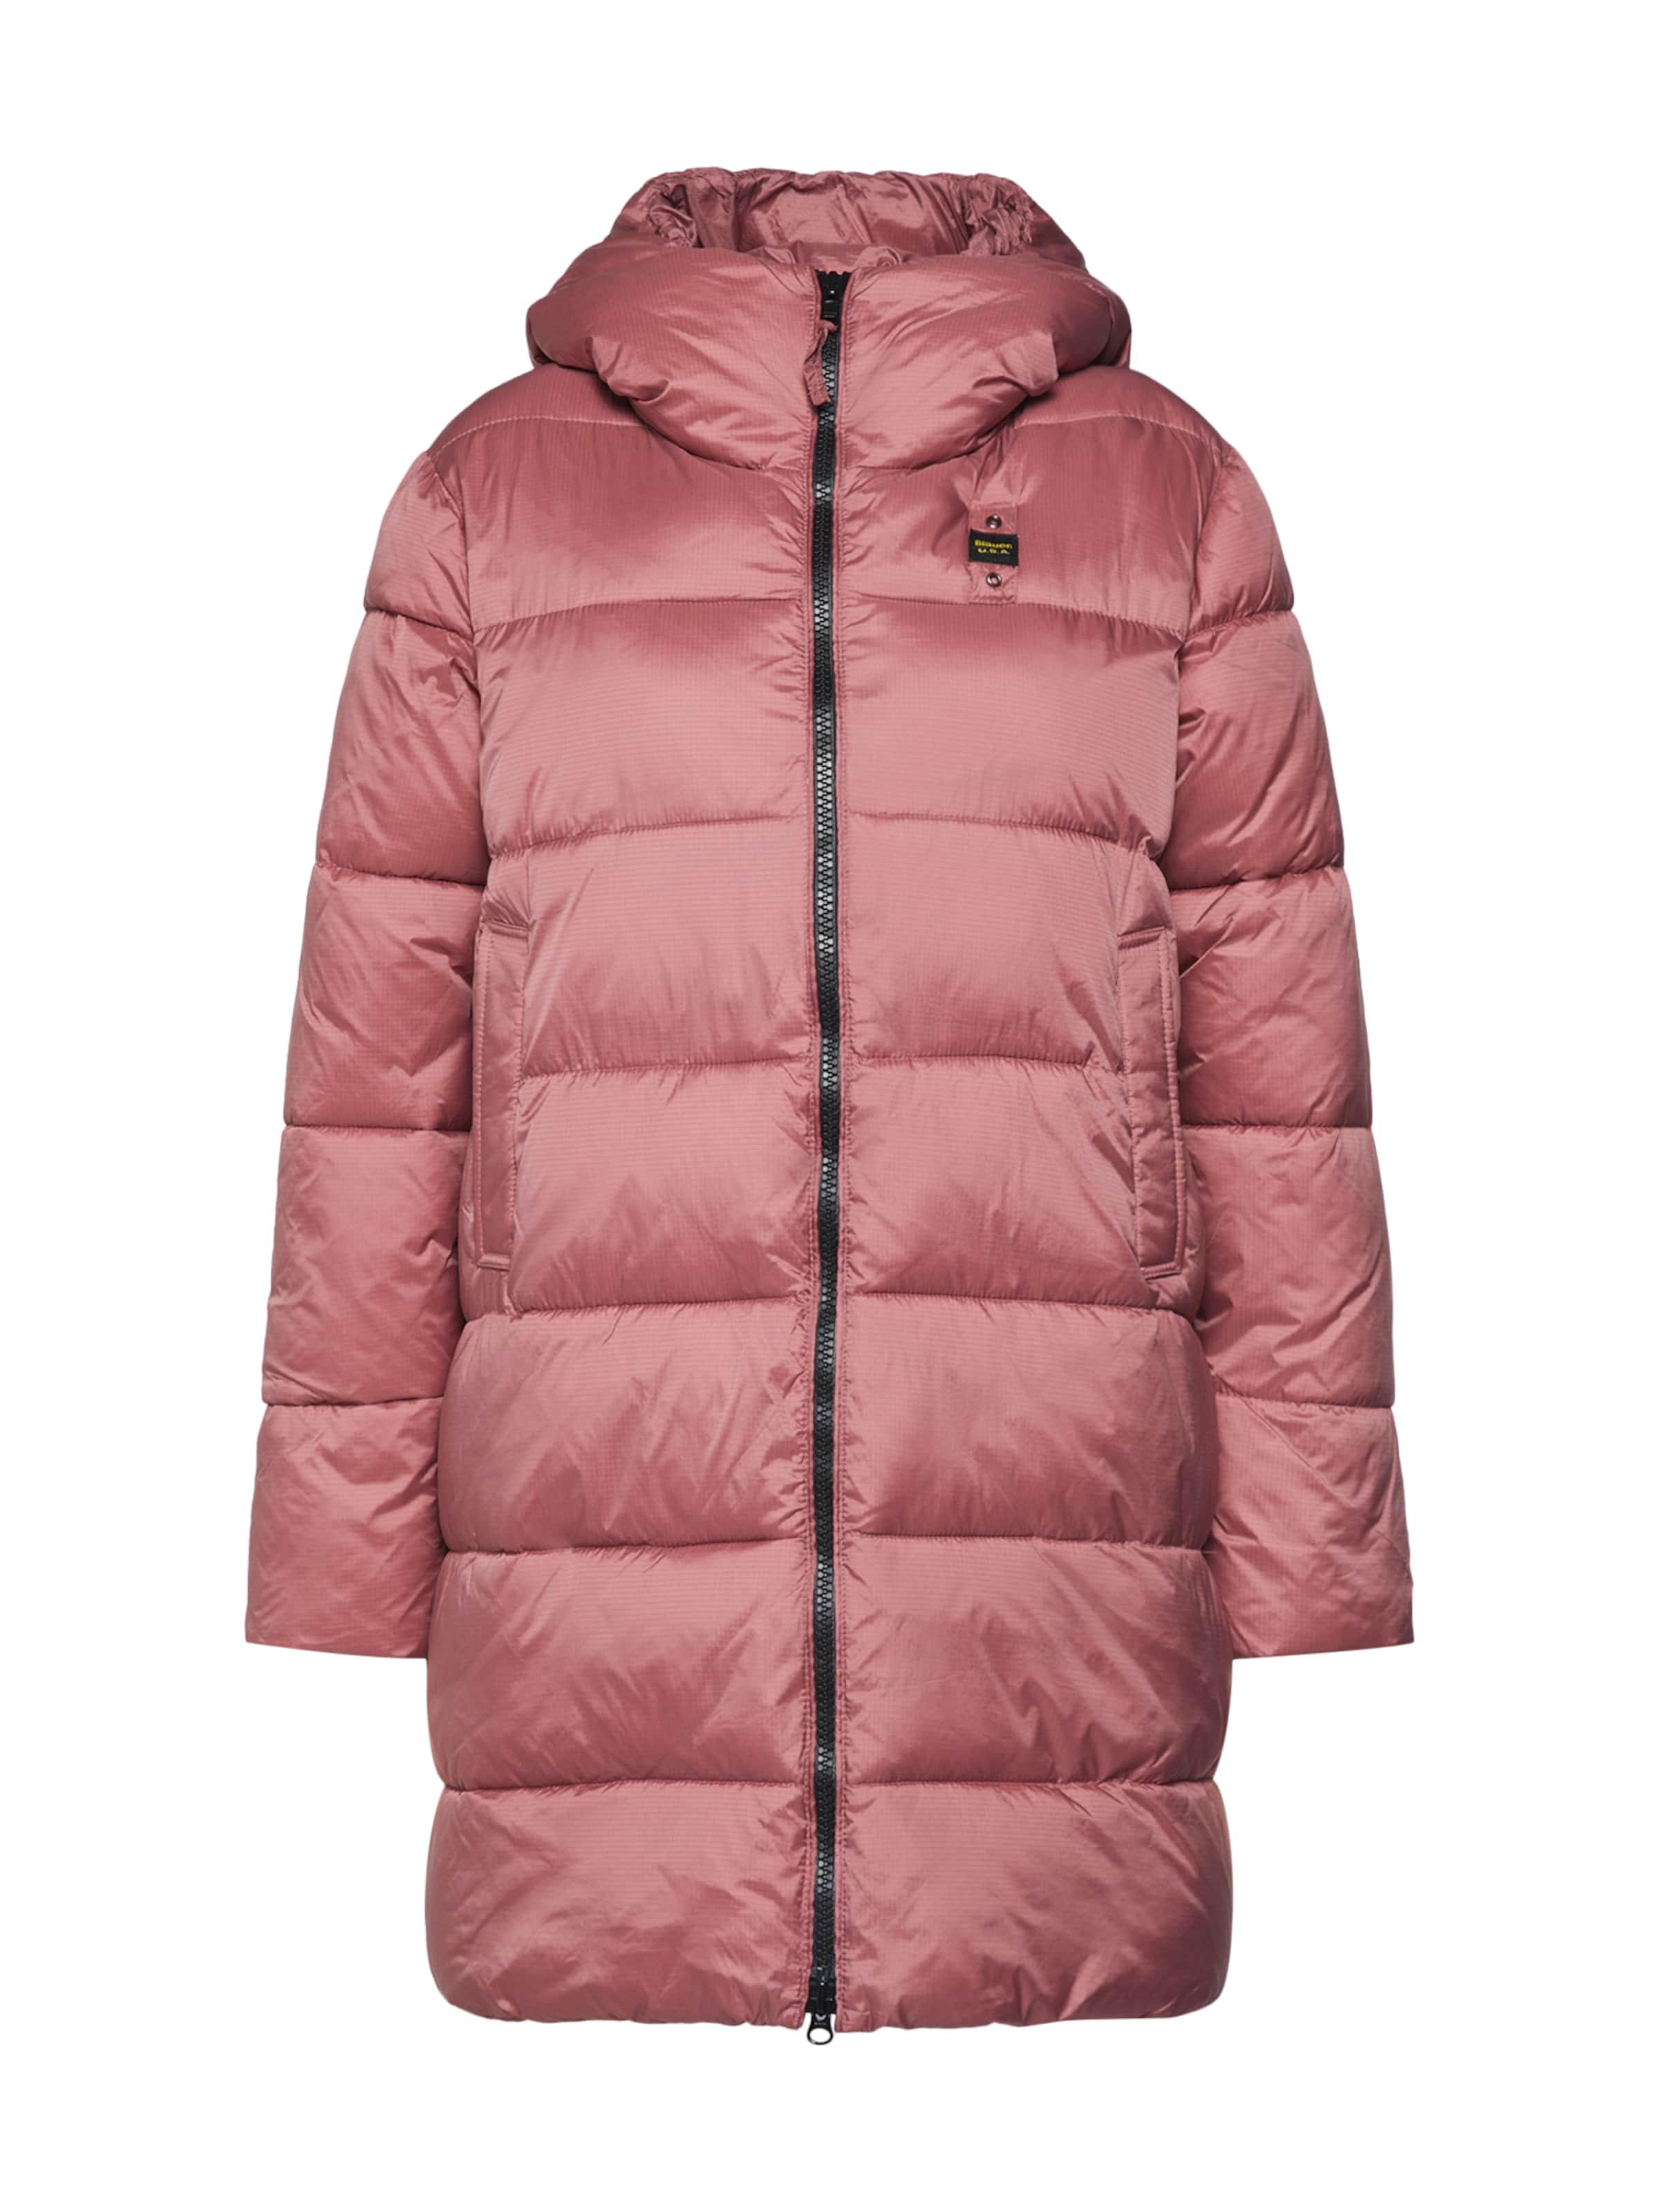 D'hiver En Rose Manteau usa Blauer 'impermeabile' gYb67yf